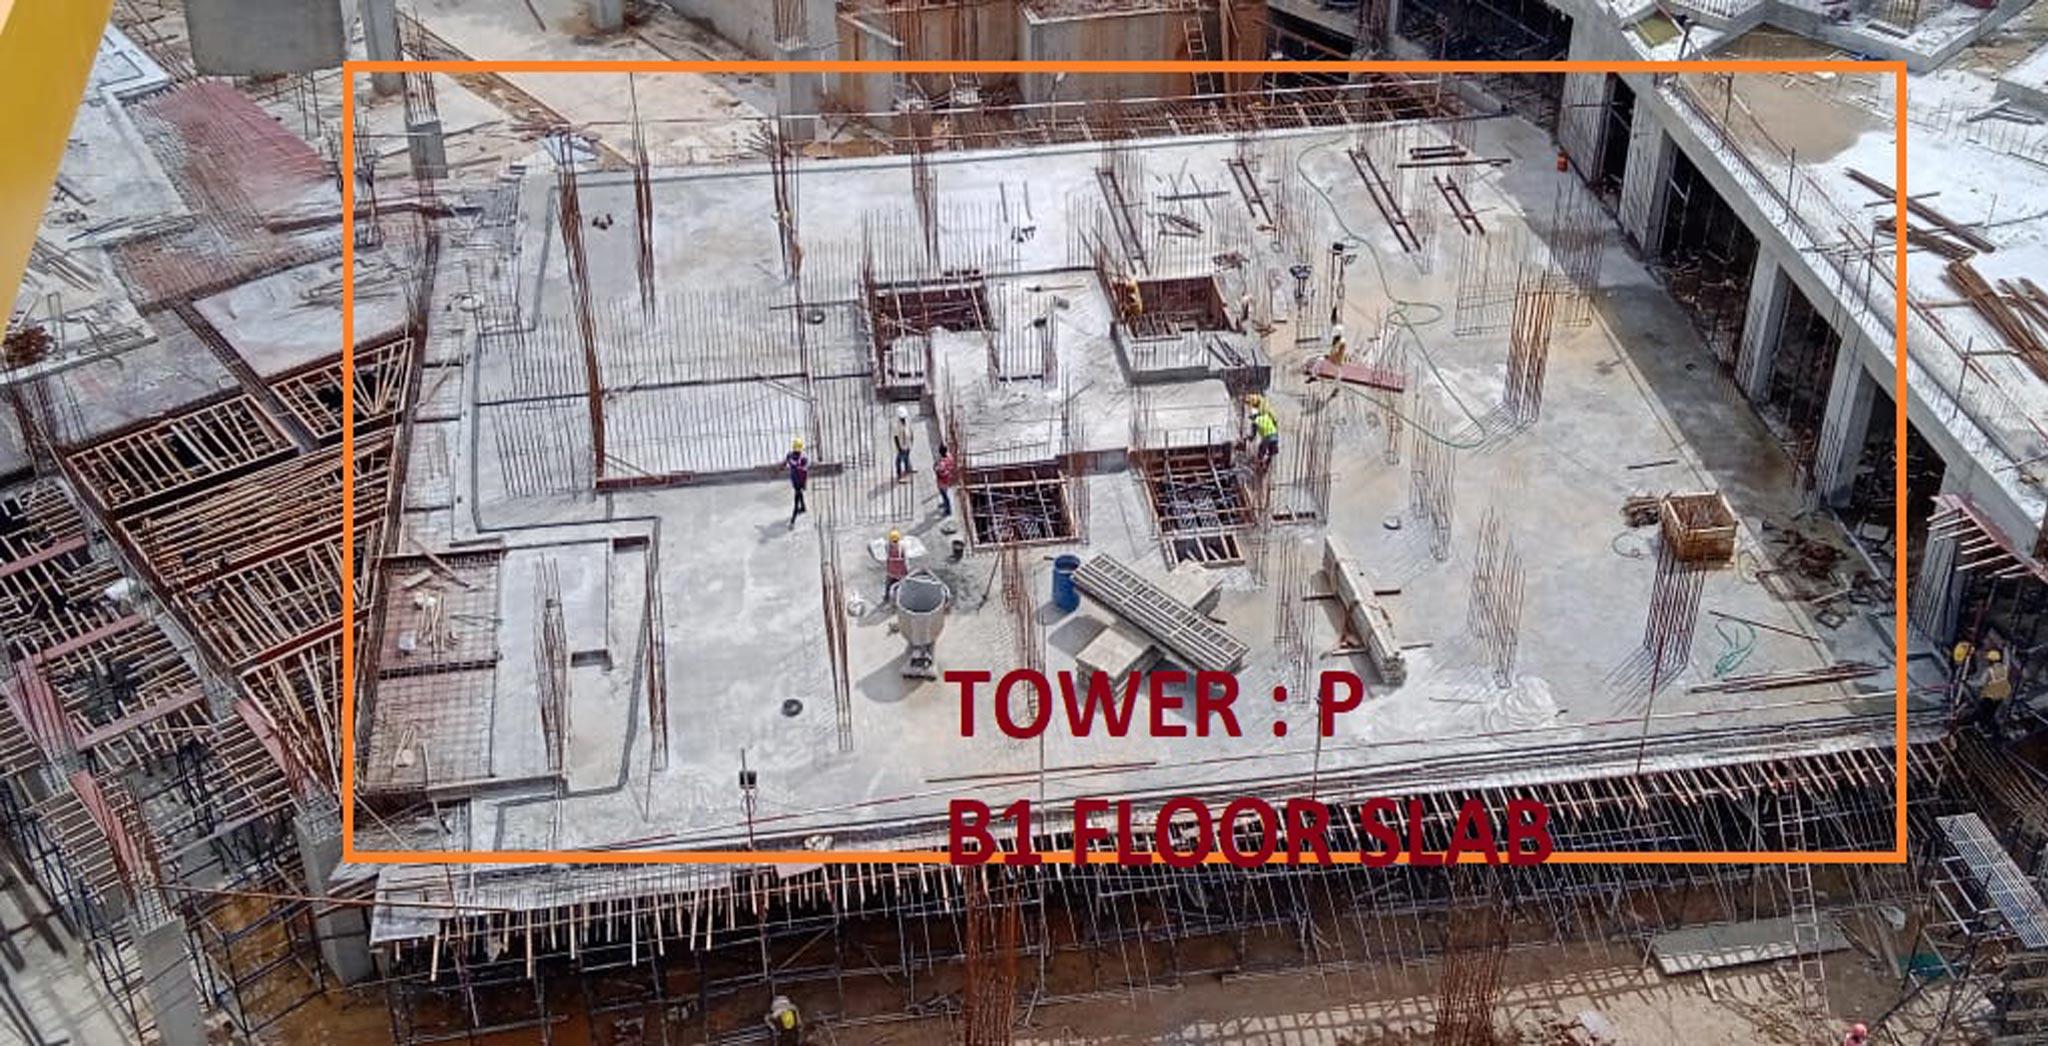 Jul 2021 - Tranquil Building: Tower  P - Casting of Upper Basement slab